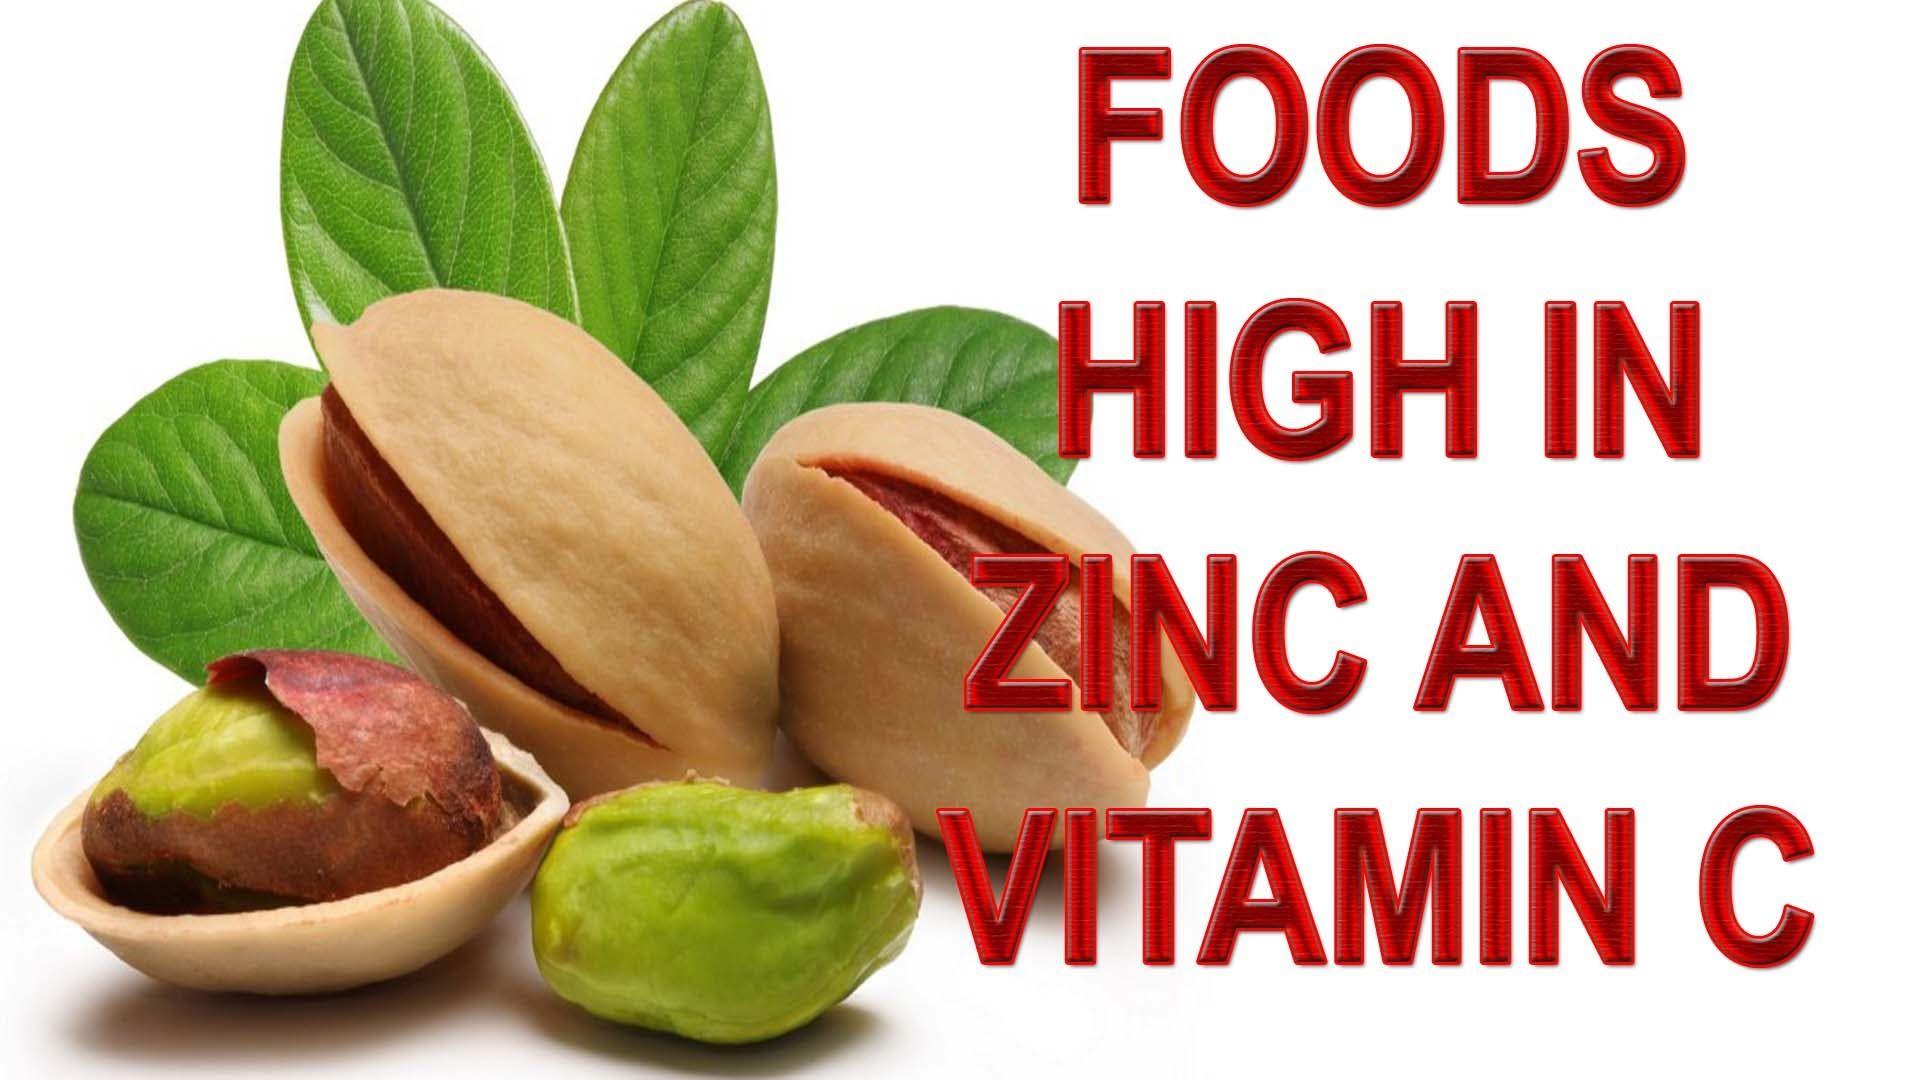 foods high in zinc and vitamin C foods high in zinc